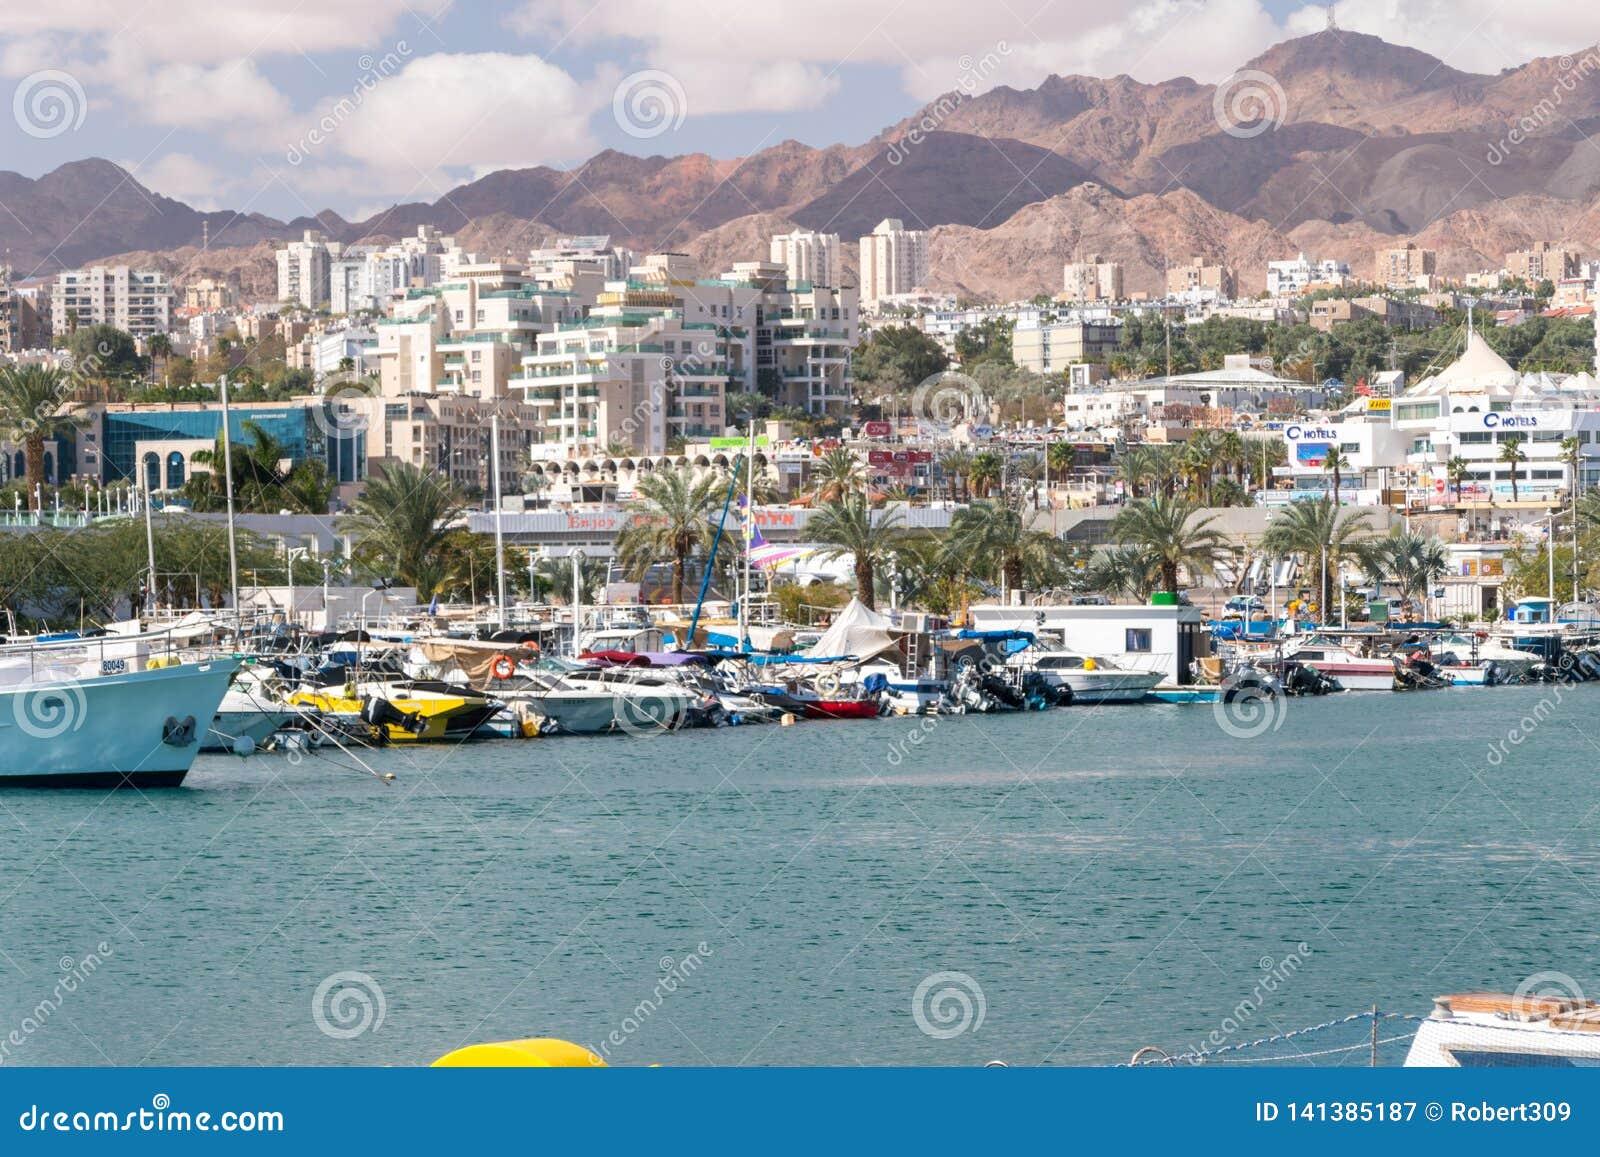 Docked yachts and boats in Eilat marina